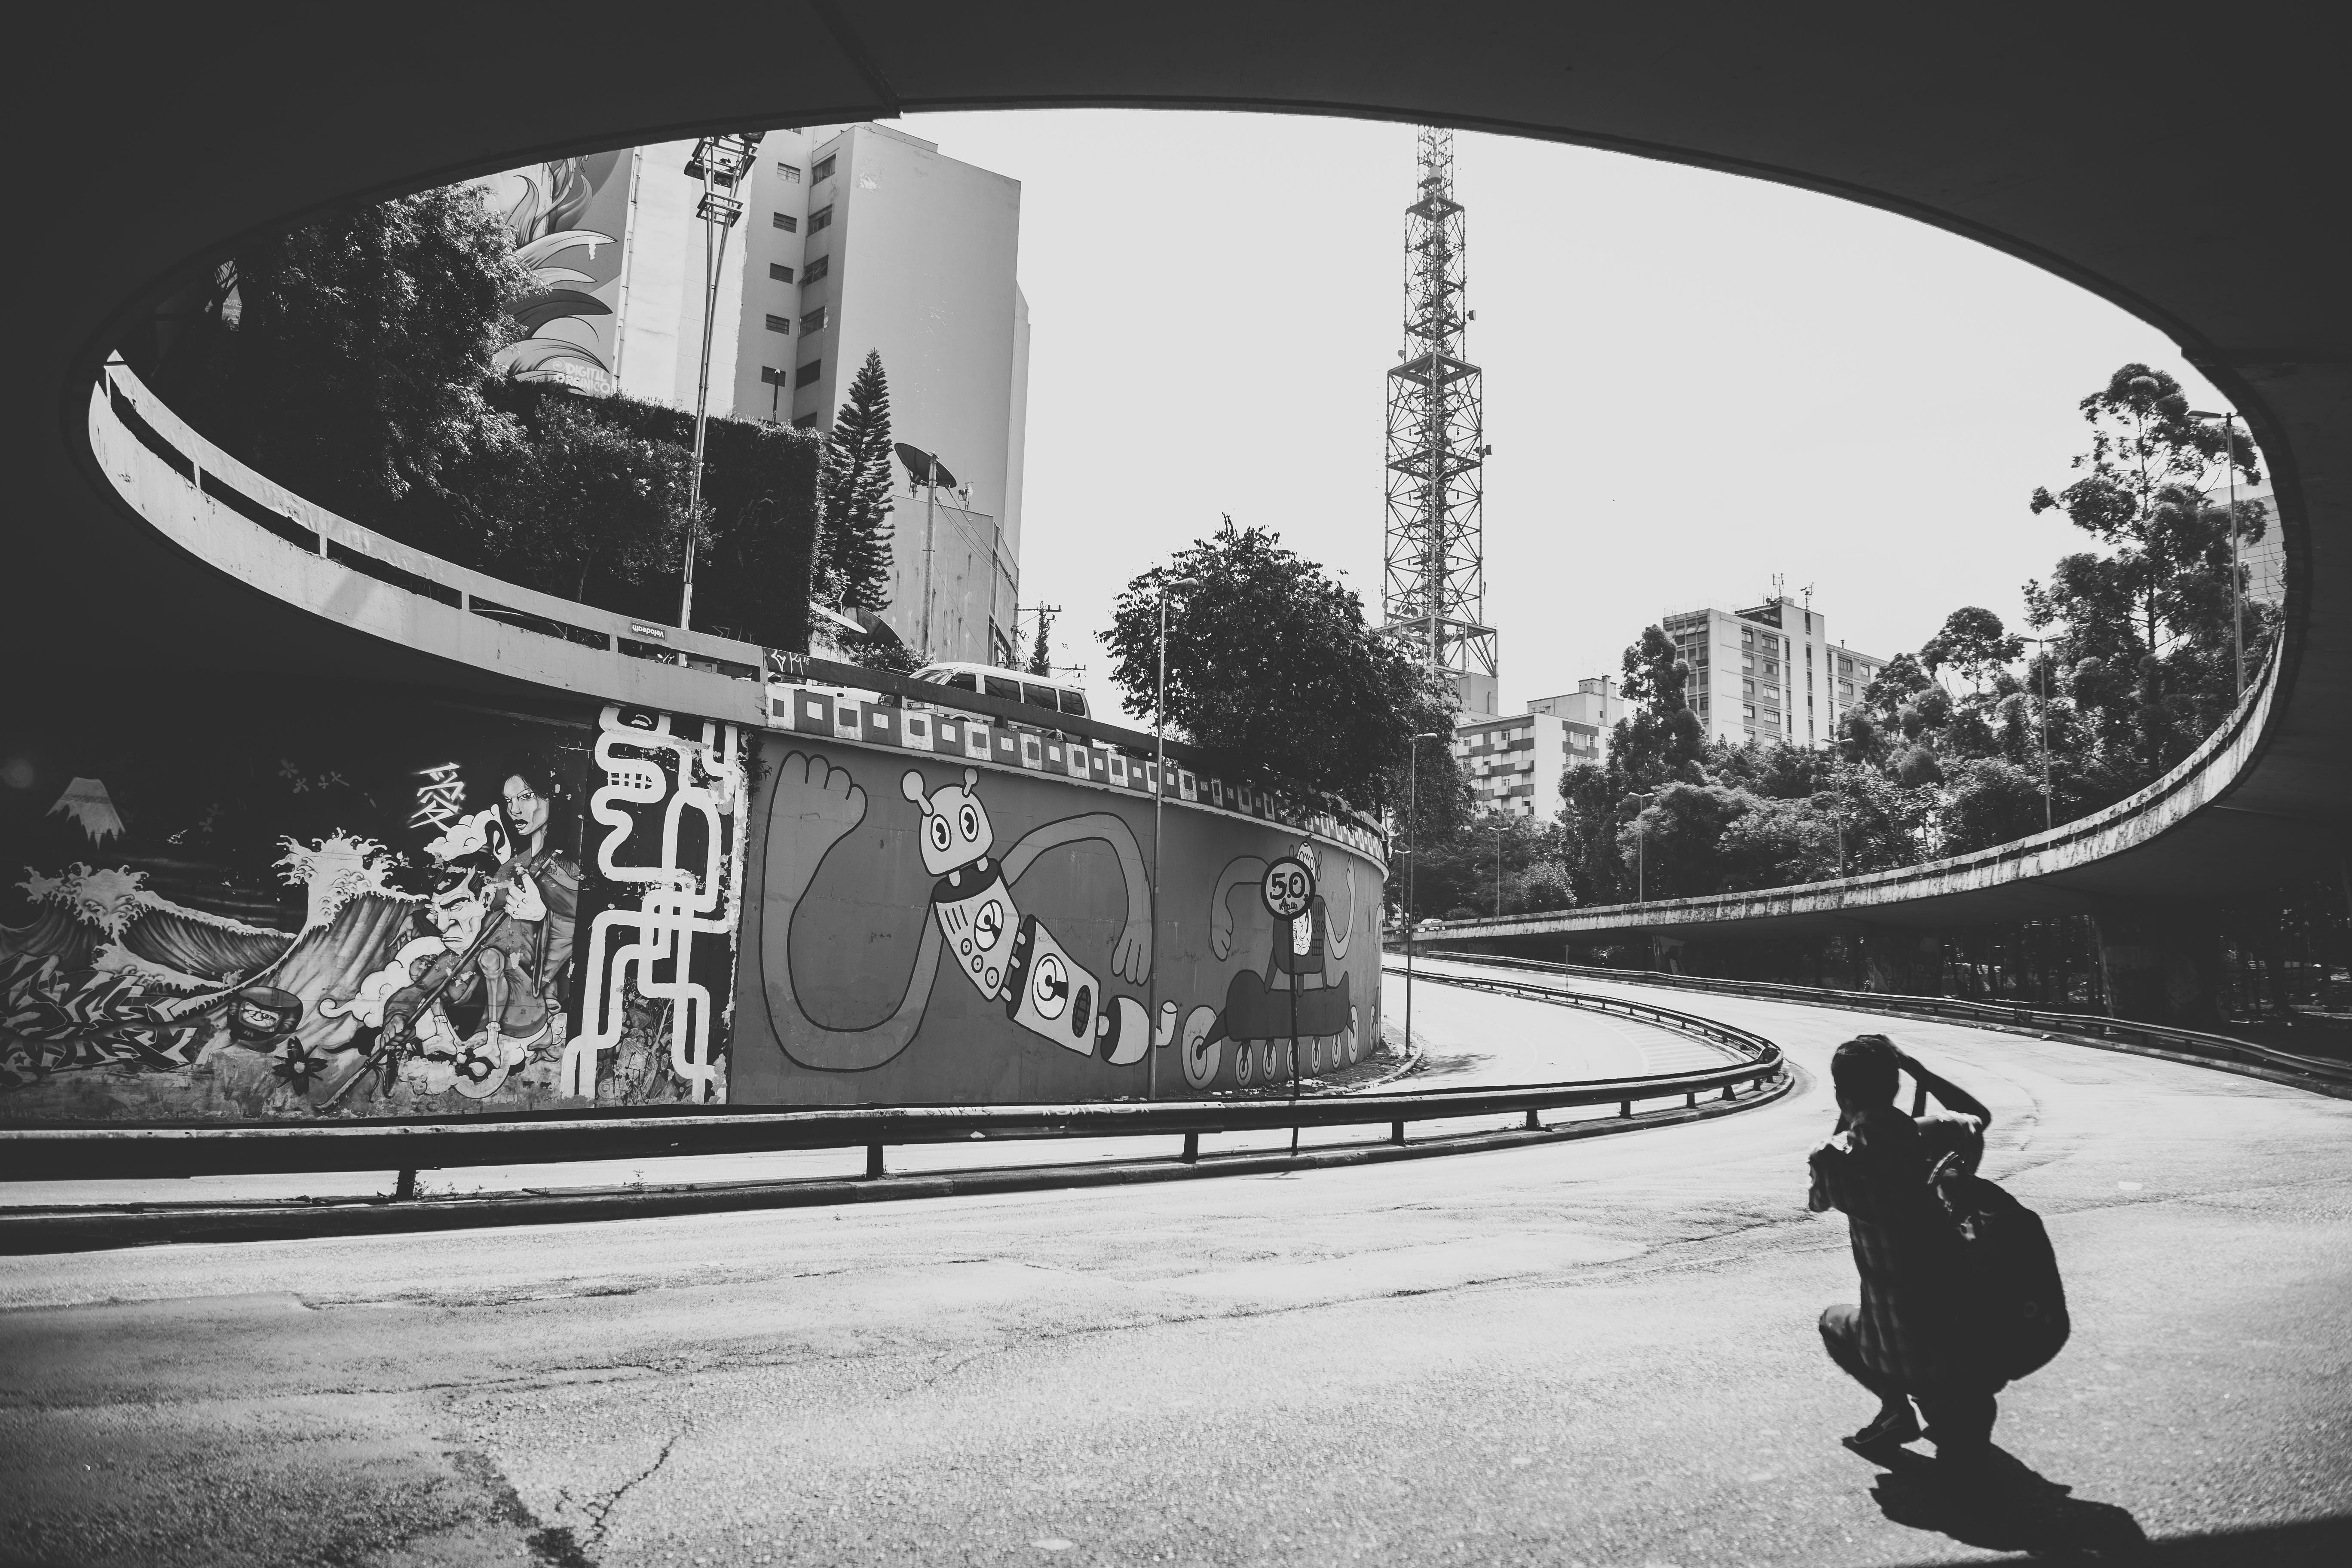 Man Taking Picture of Graffiti Wall